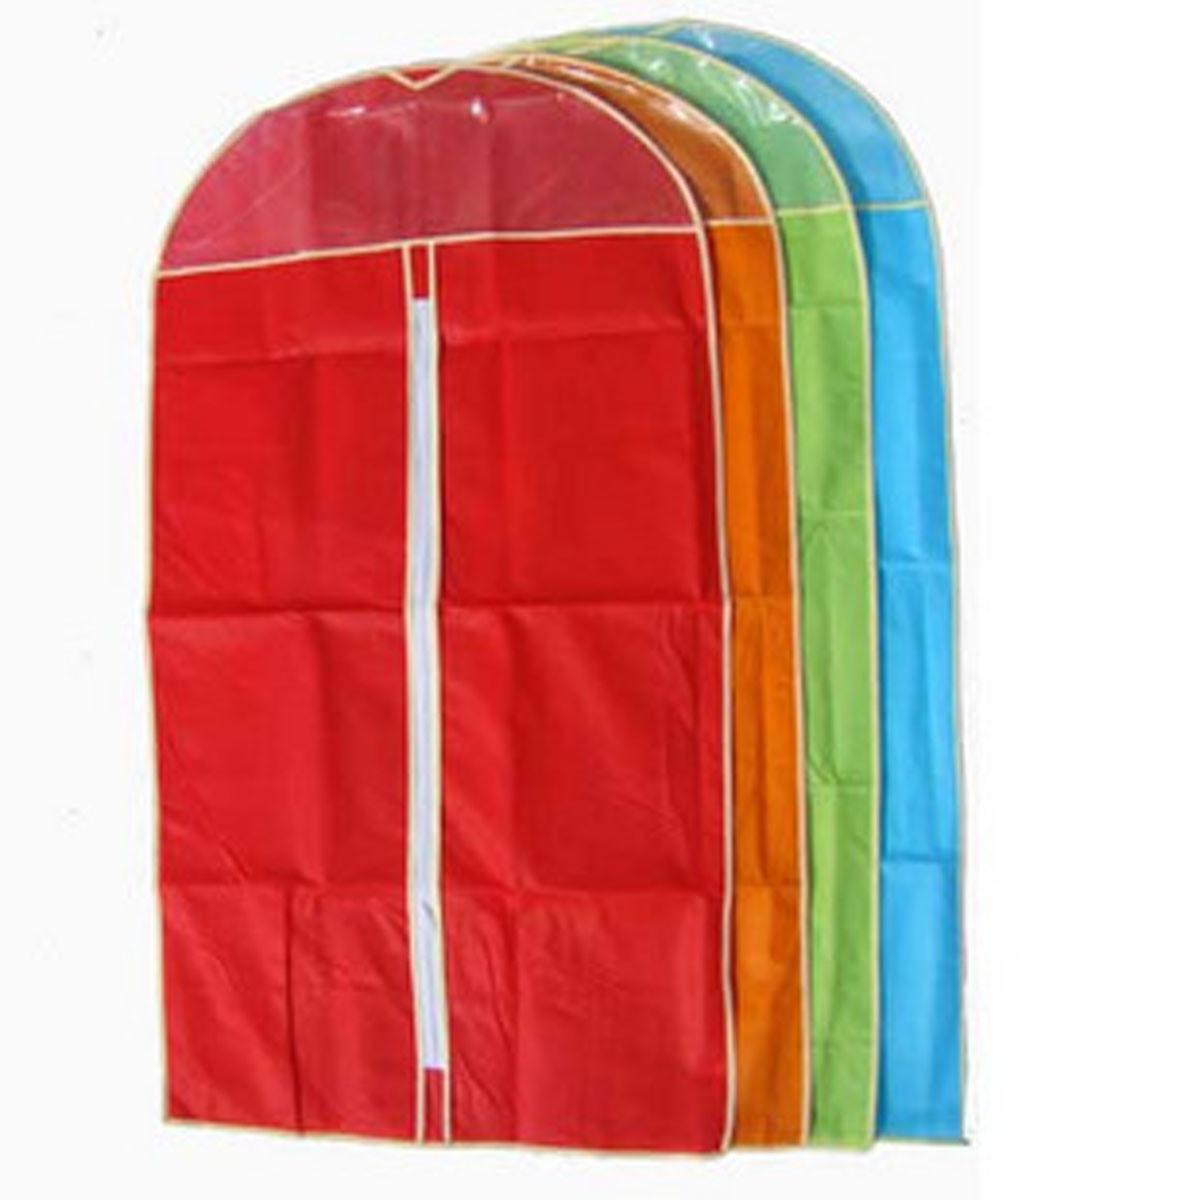 Suit garment bag india